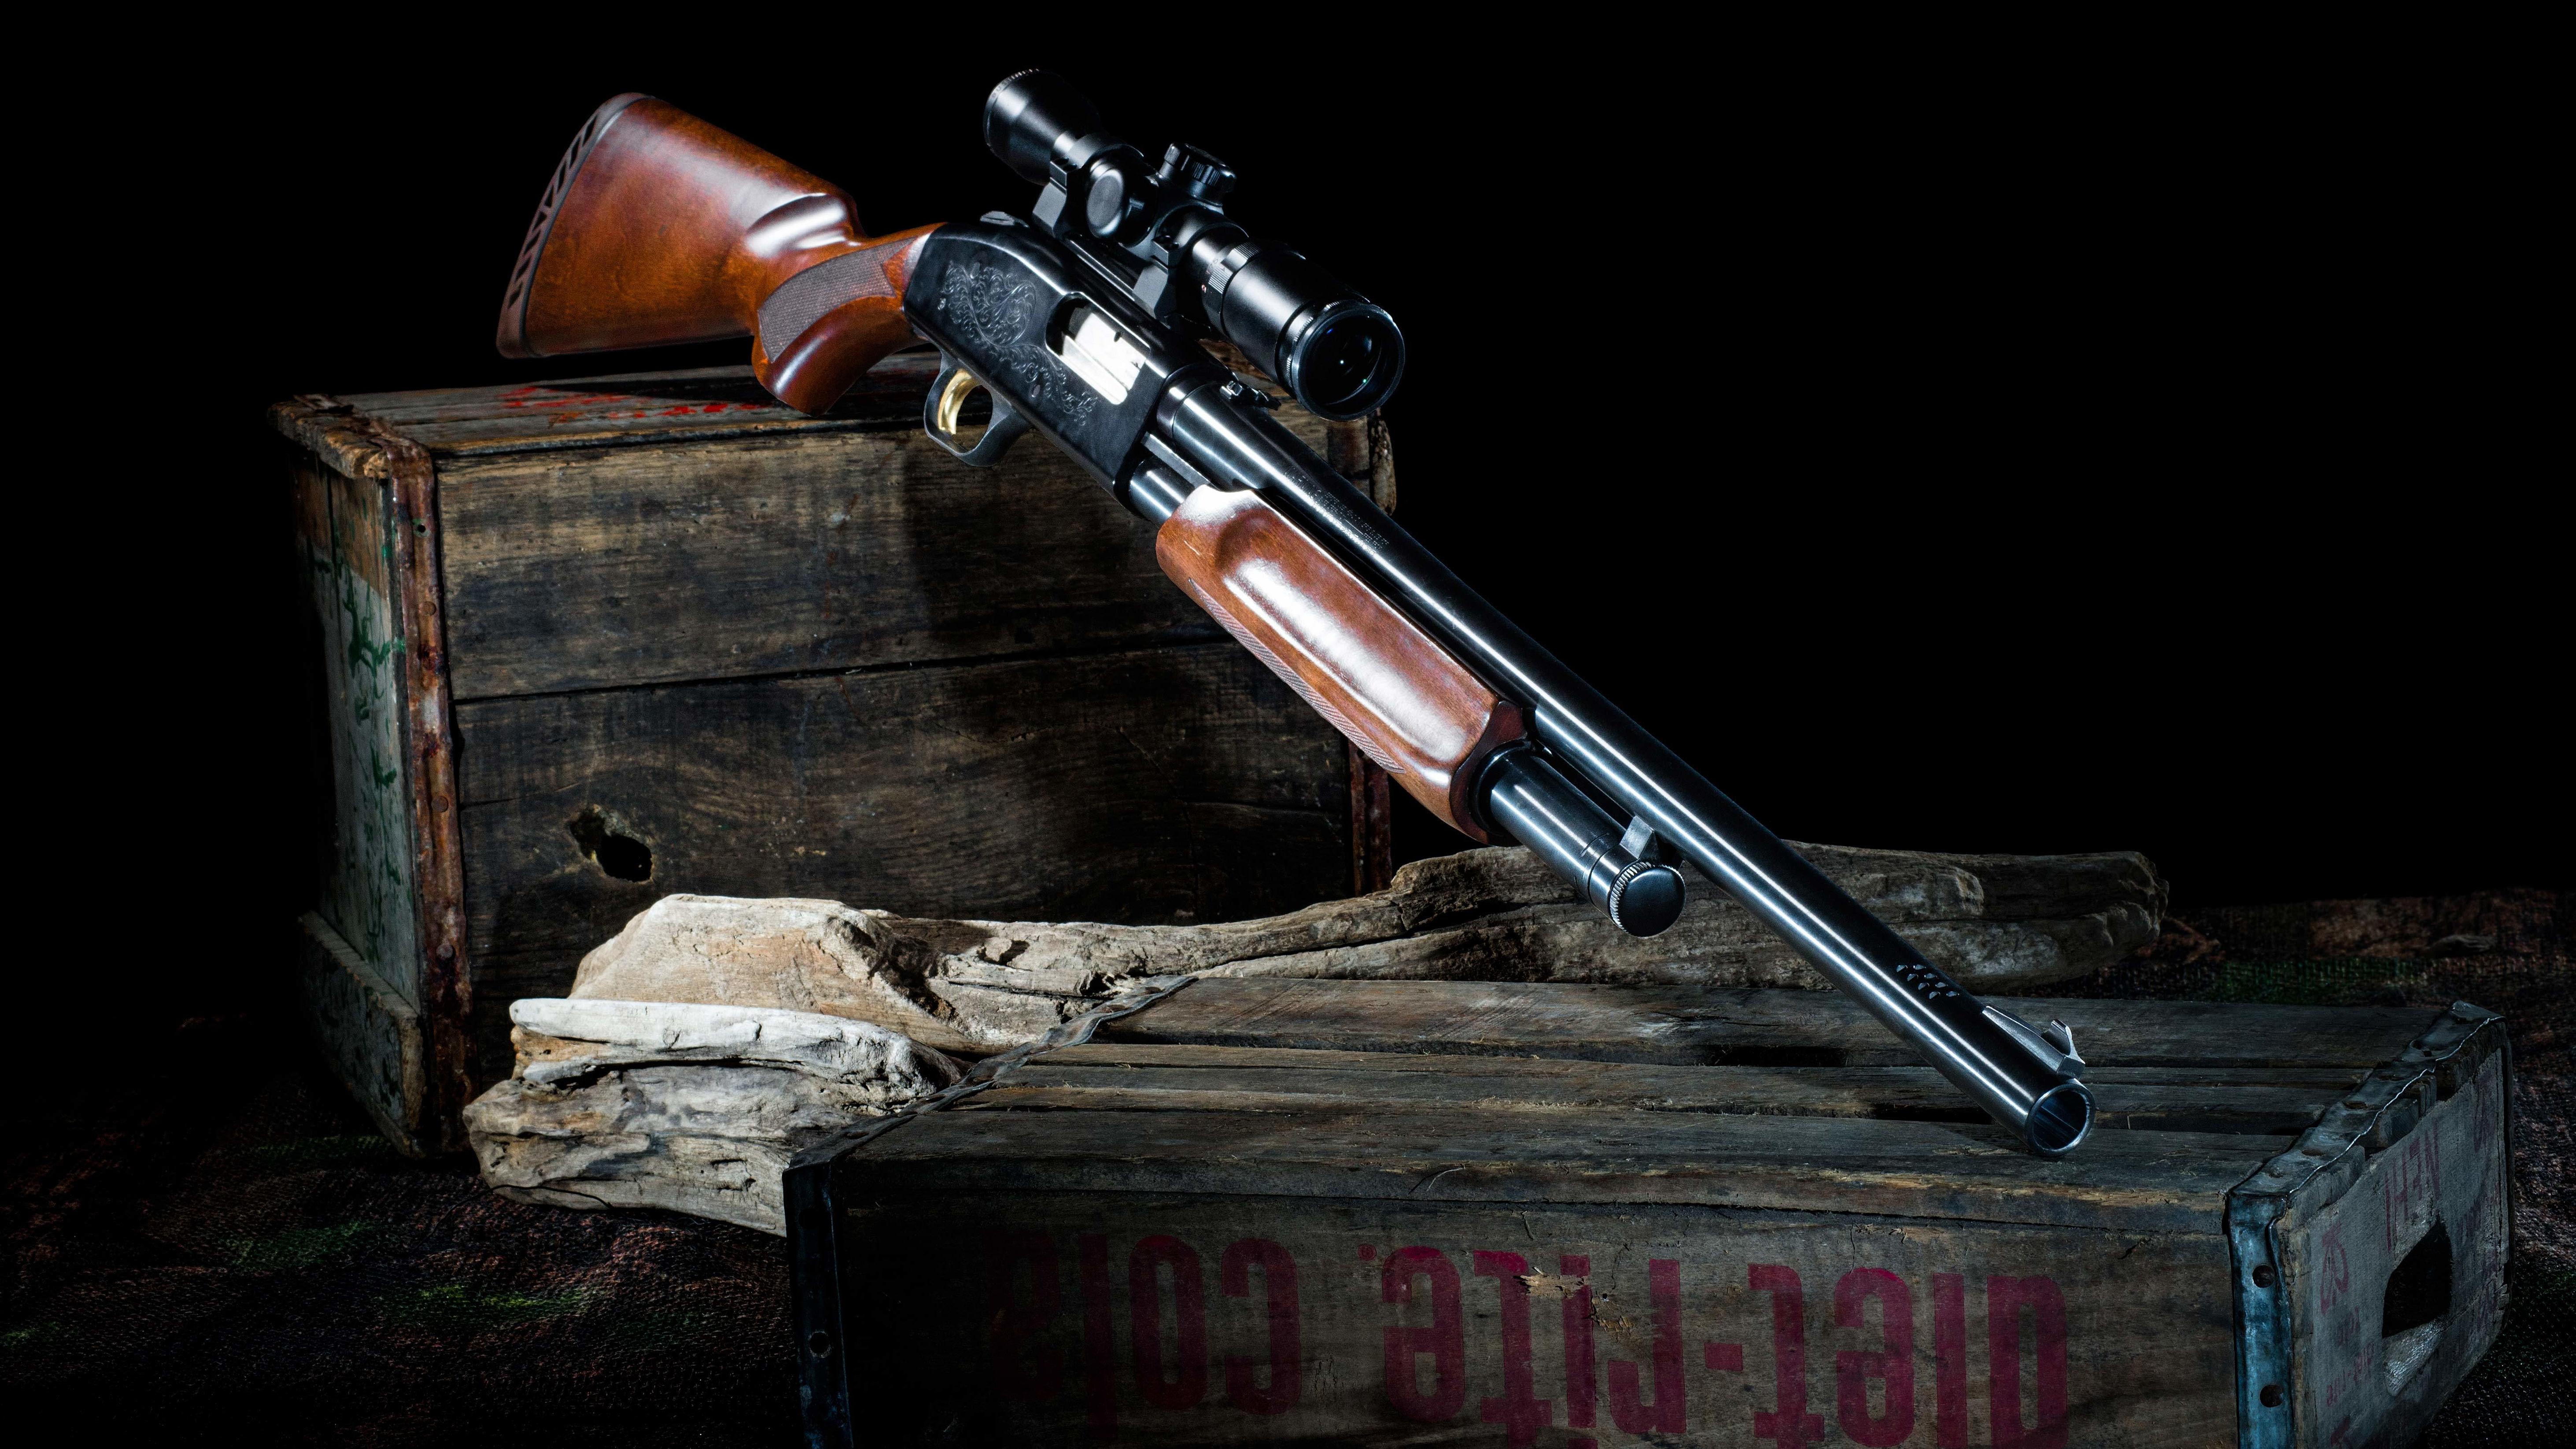 Mossberg 500 Shotgun 5k Retina Ultra HD Wallpaper and Background